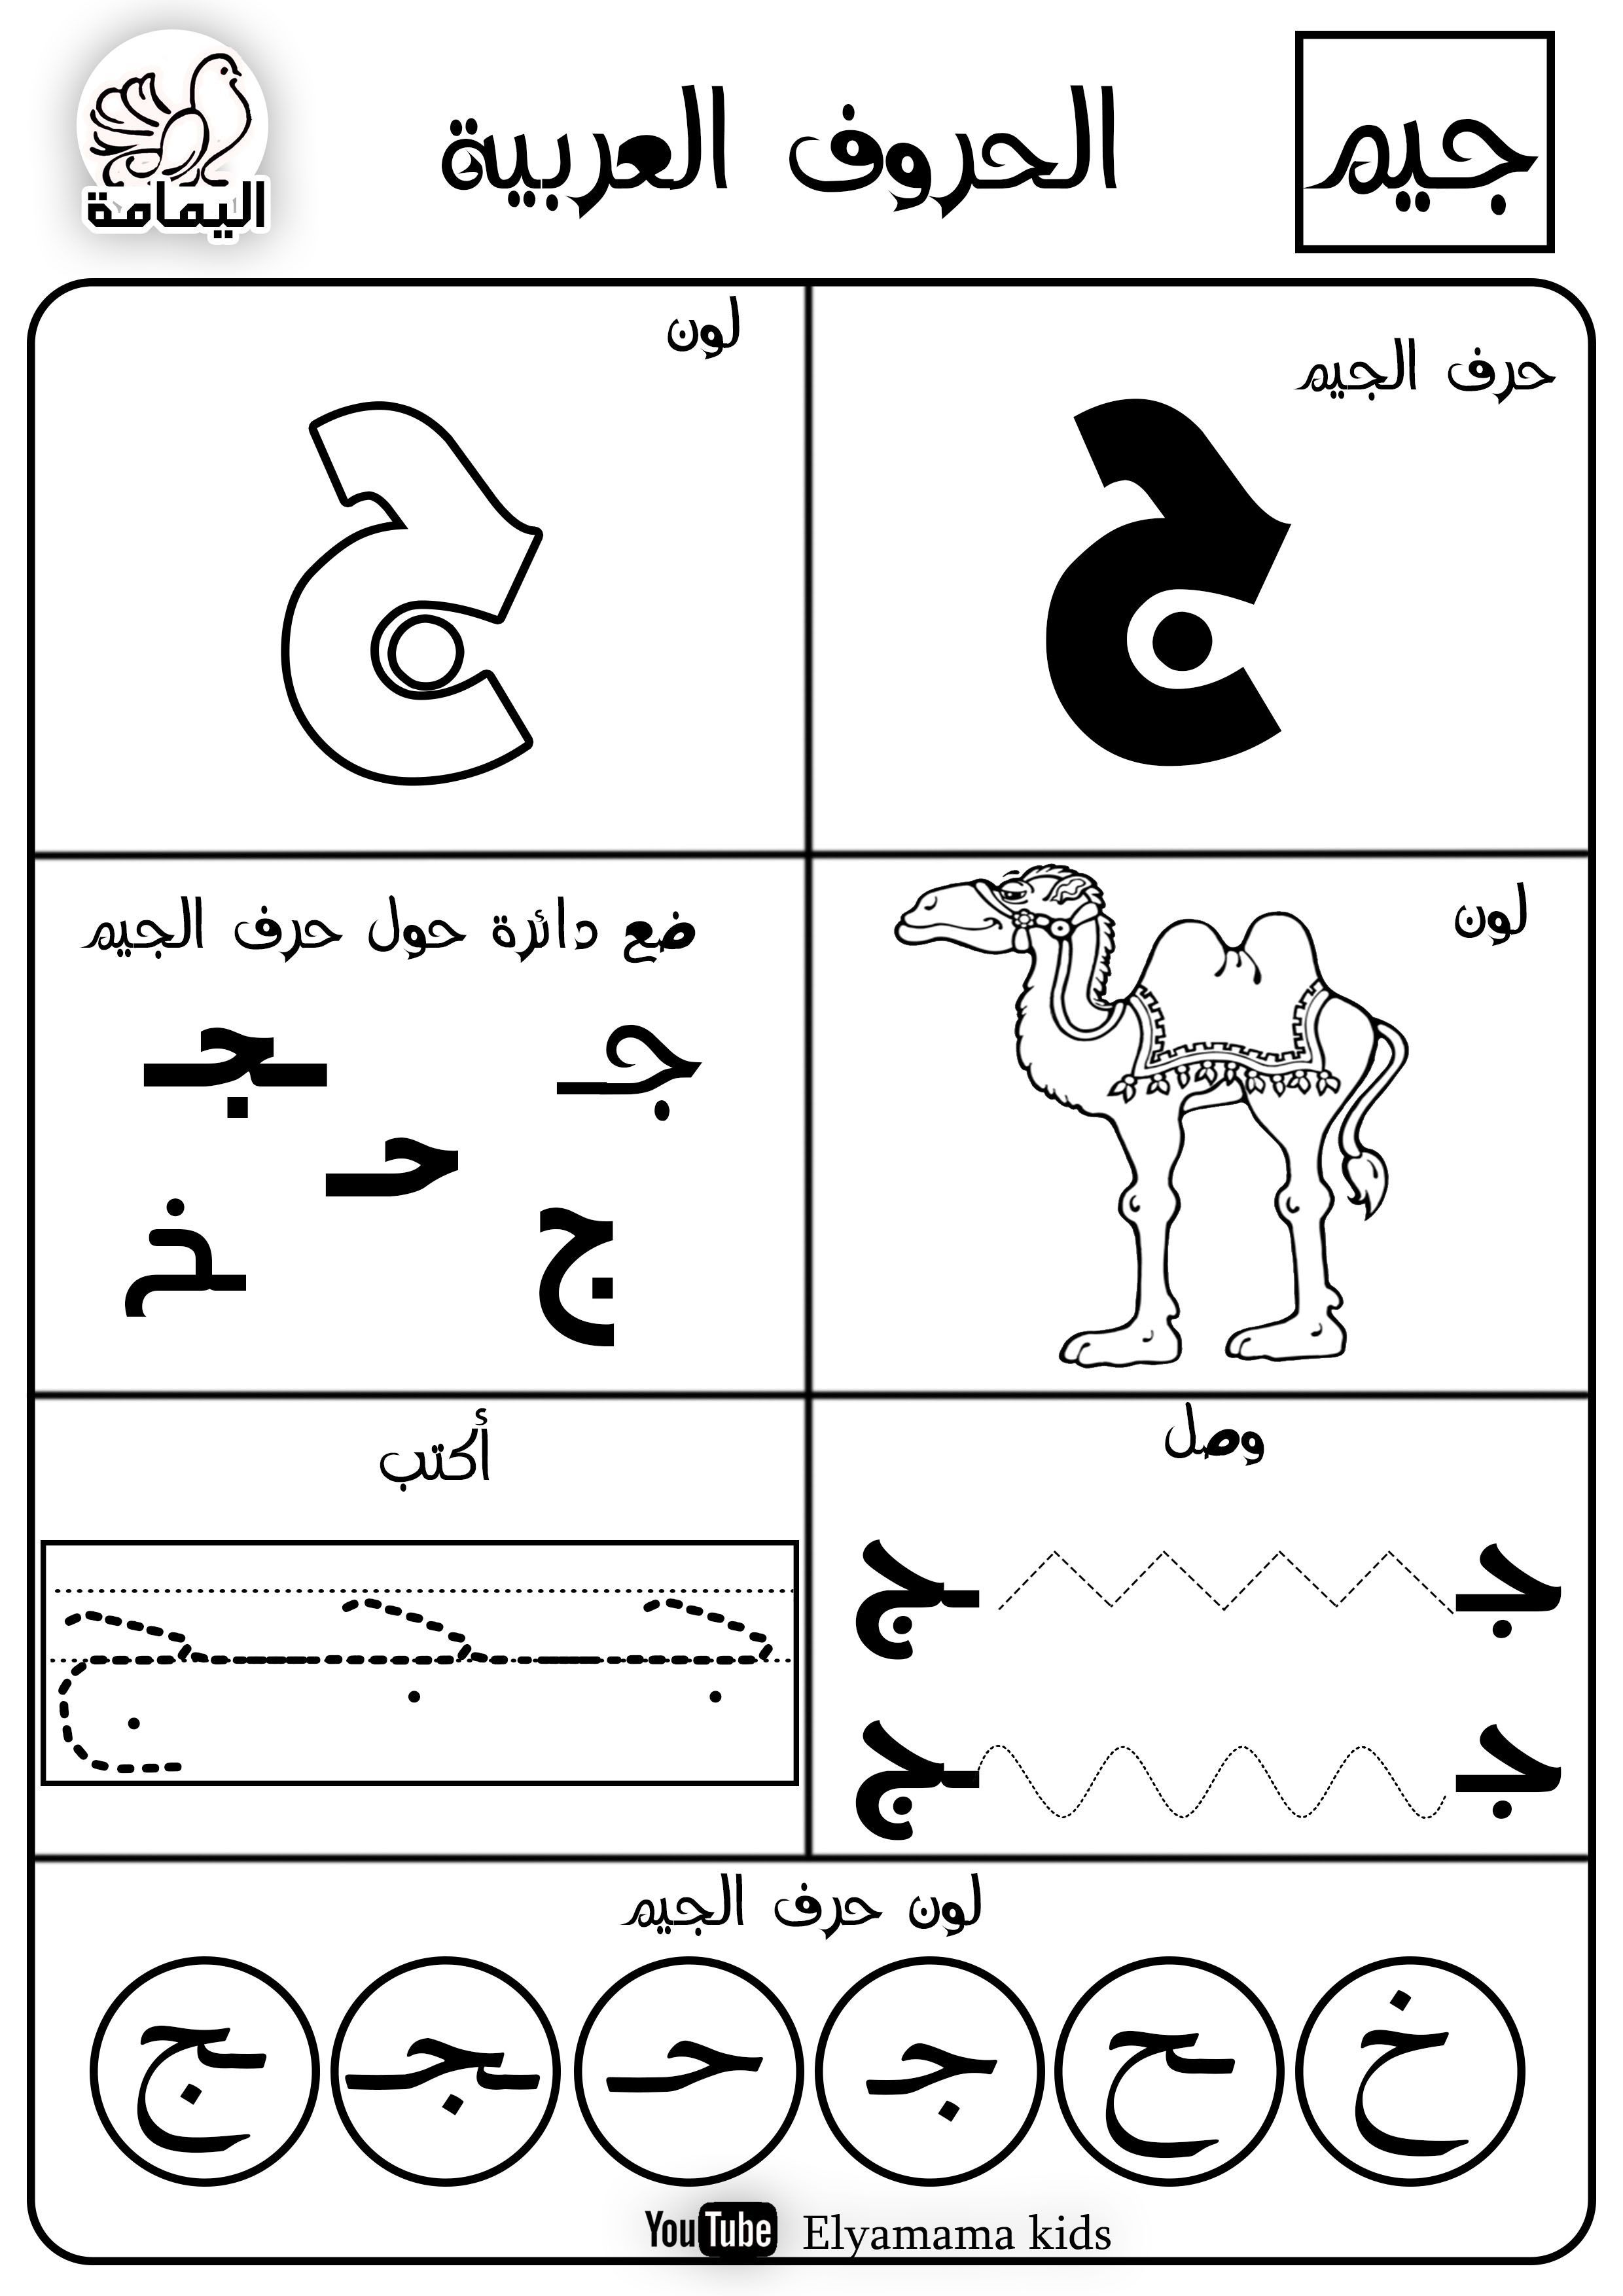 Learnarabicworksheets